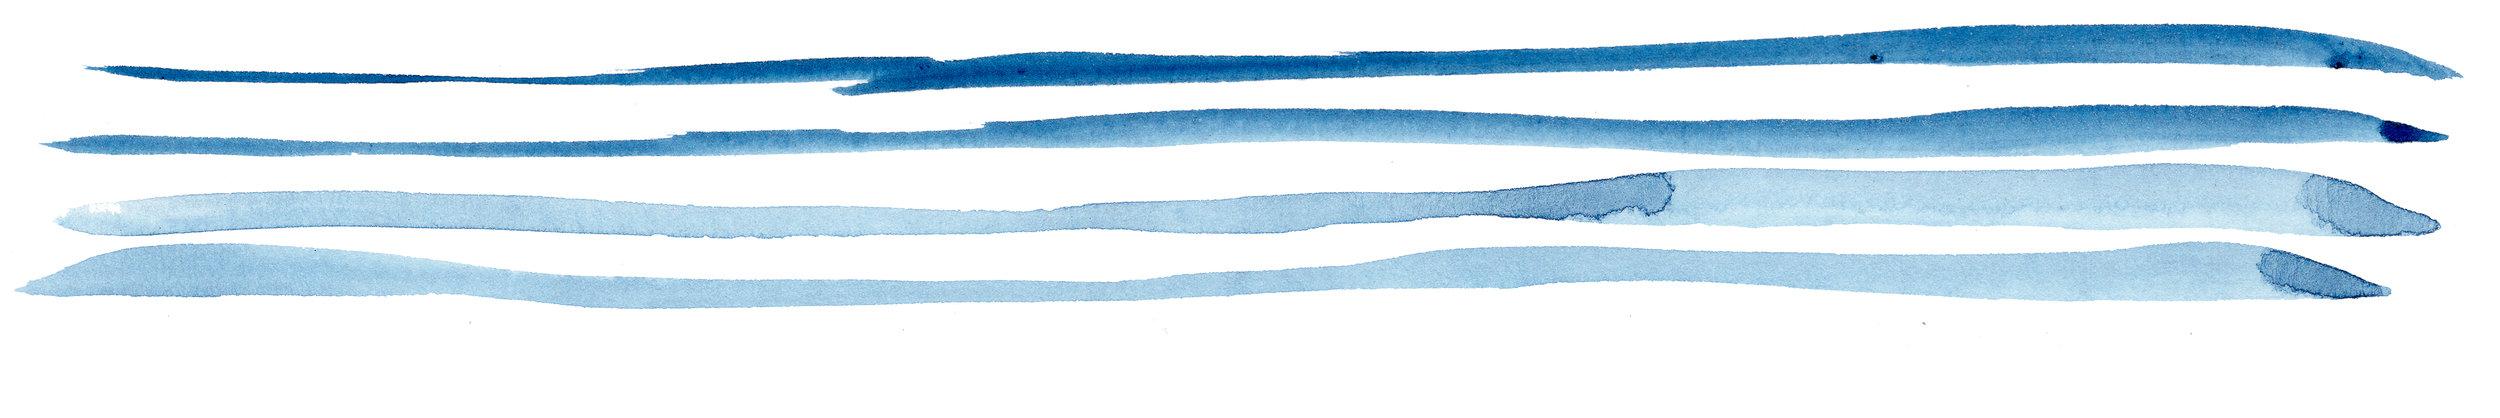 7 Stripes.jpg